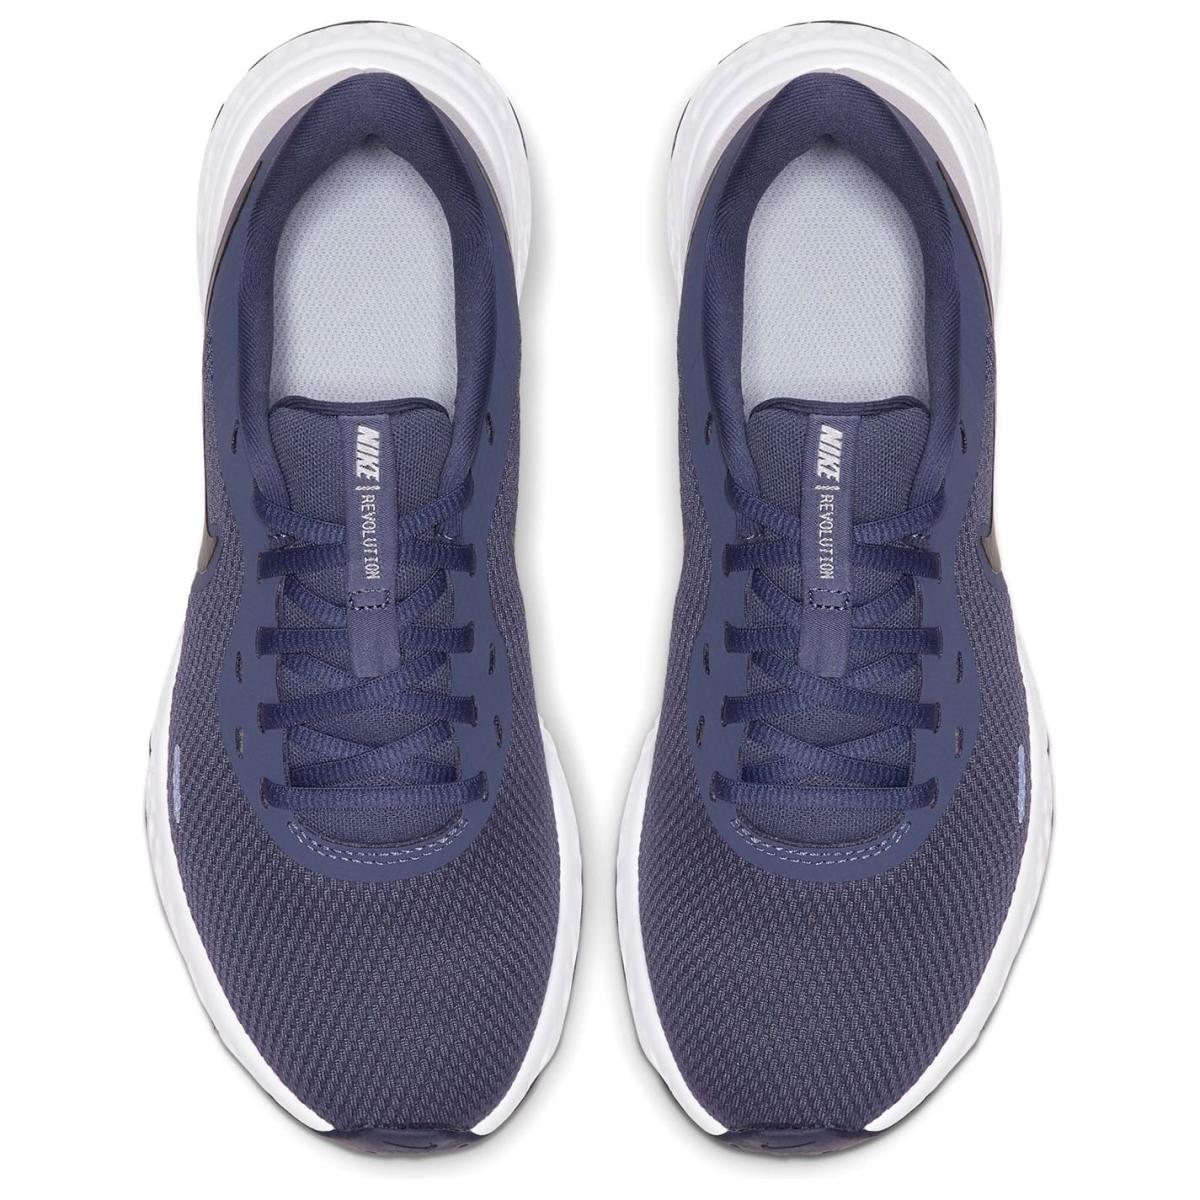 Nike-Revolution-Turnschuhe-Damen-Sneaker-Sportschuhe-Laufschuhe-1160 Indexbild 46